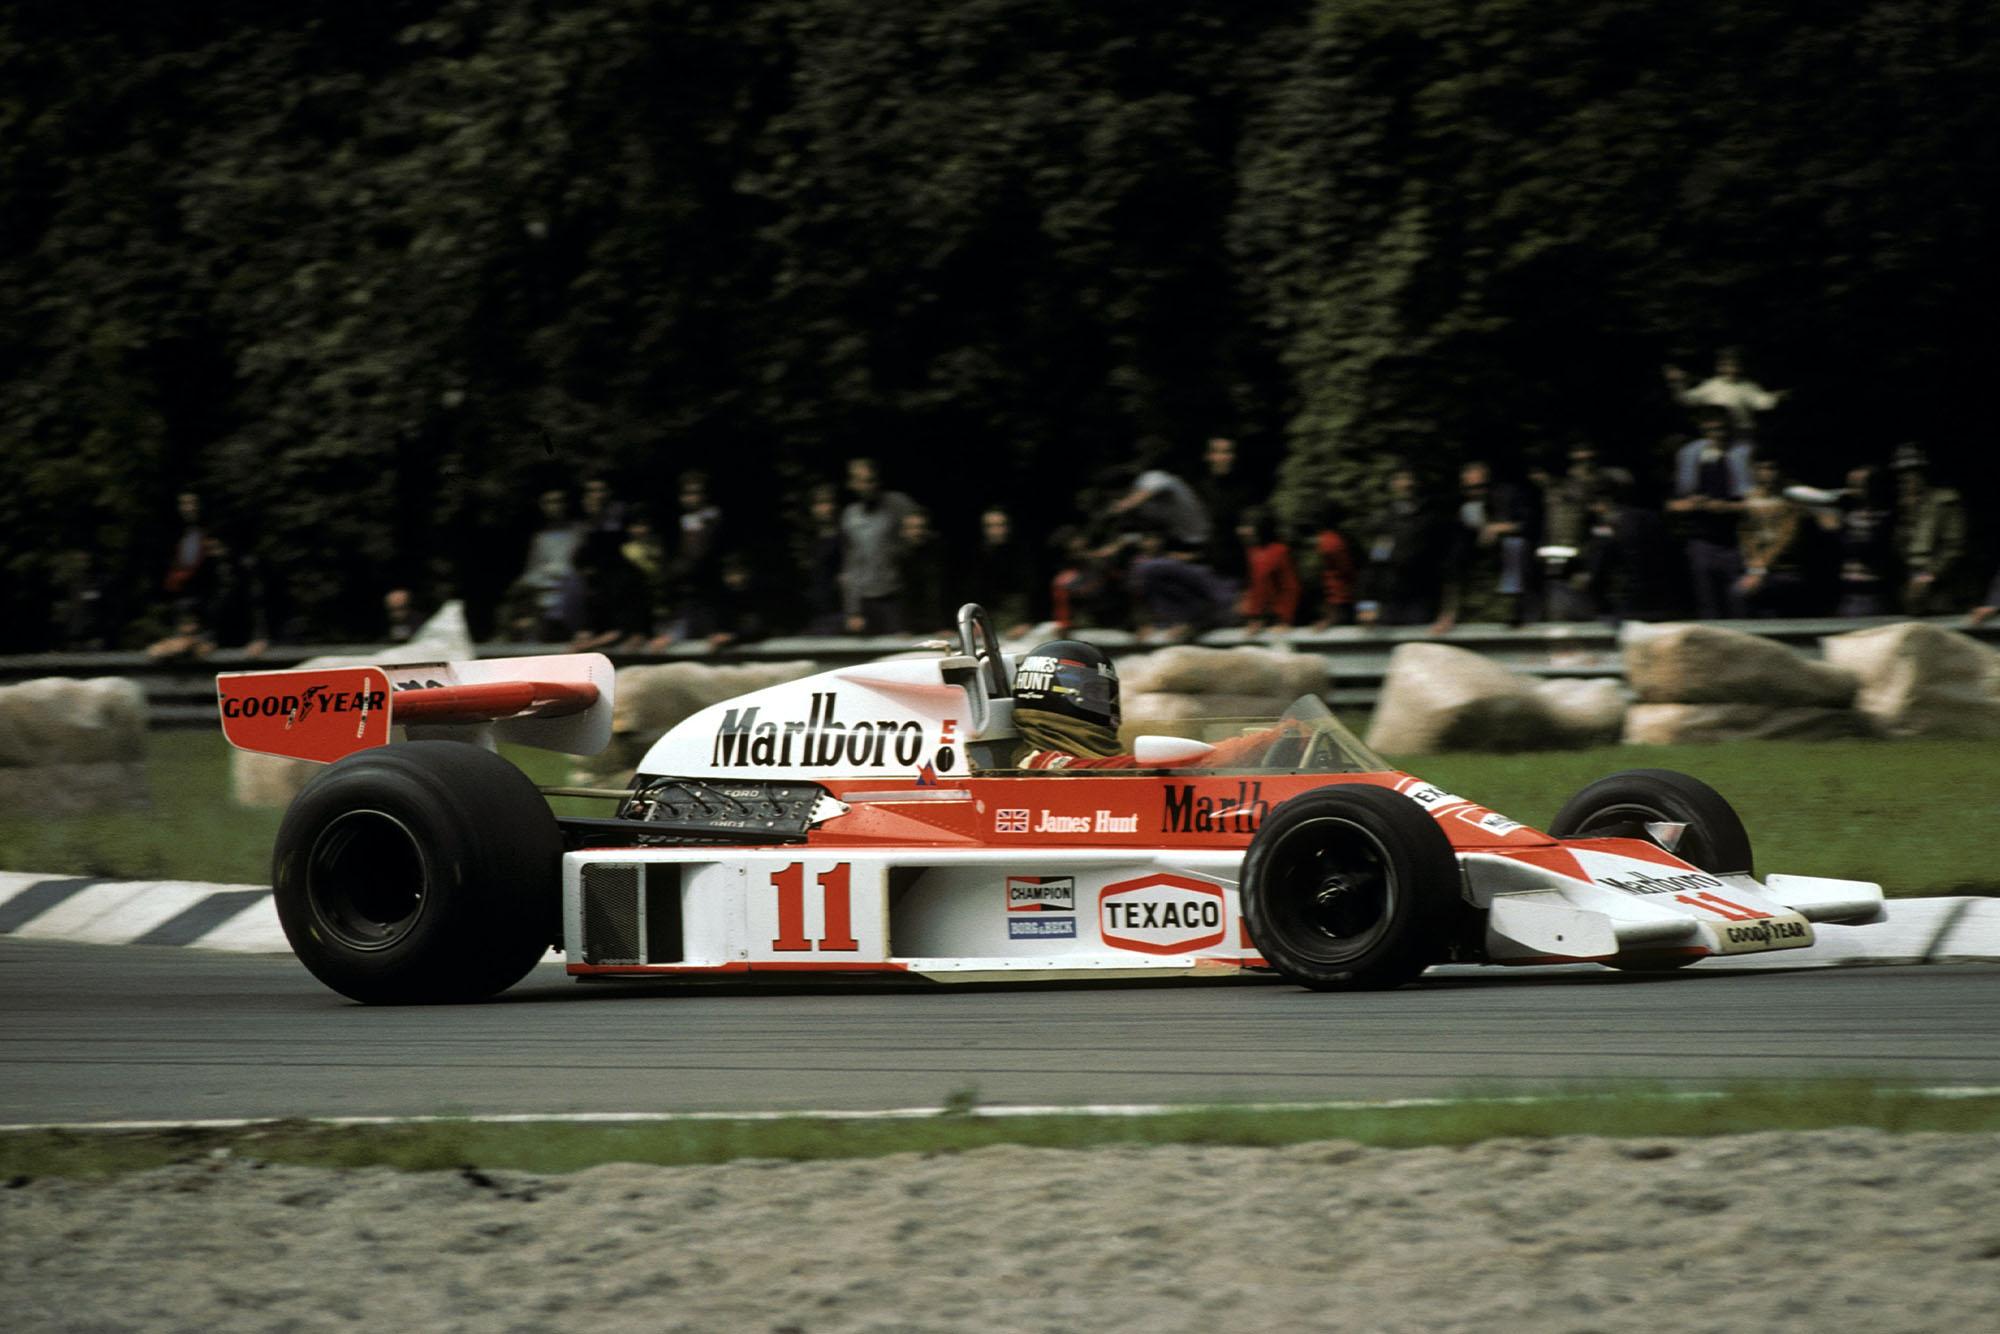 James Hunt (McLaren) spun off on Lap 11, 1976 Italian Grand Prix, Monza.